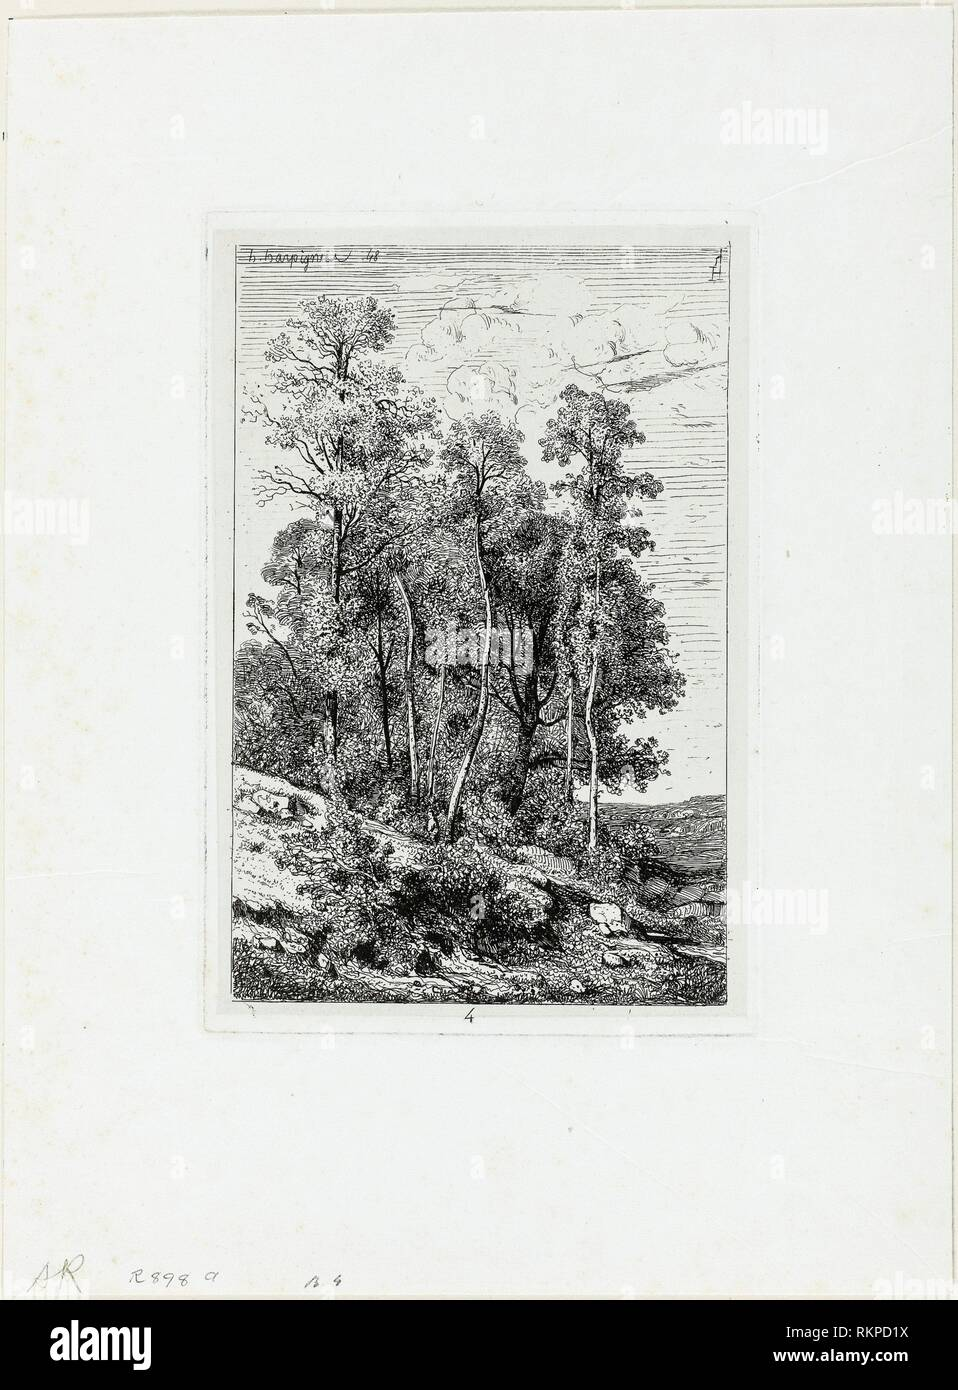 Birches and Oaks - 1848, printed 1849 - Henri Joseph Harpignies French, 1819-1916 - Artist: Henri Joseph Harpignies, Origin: France, Date: 1848, - Stock Image